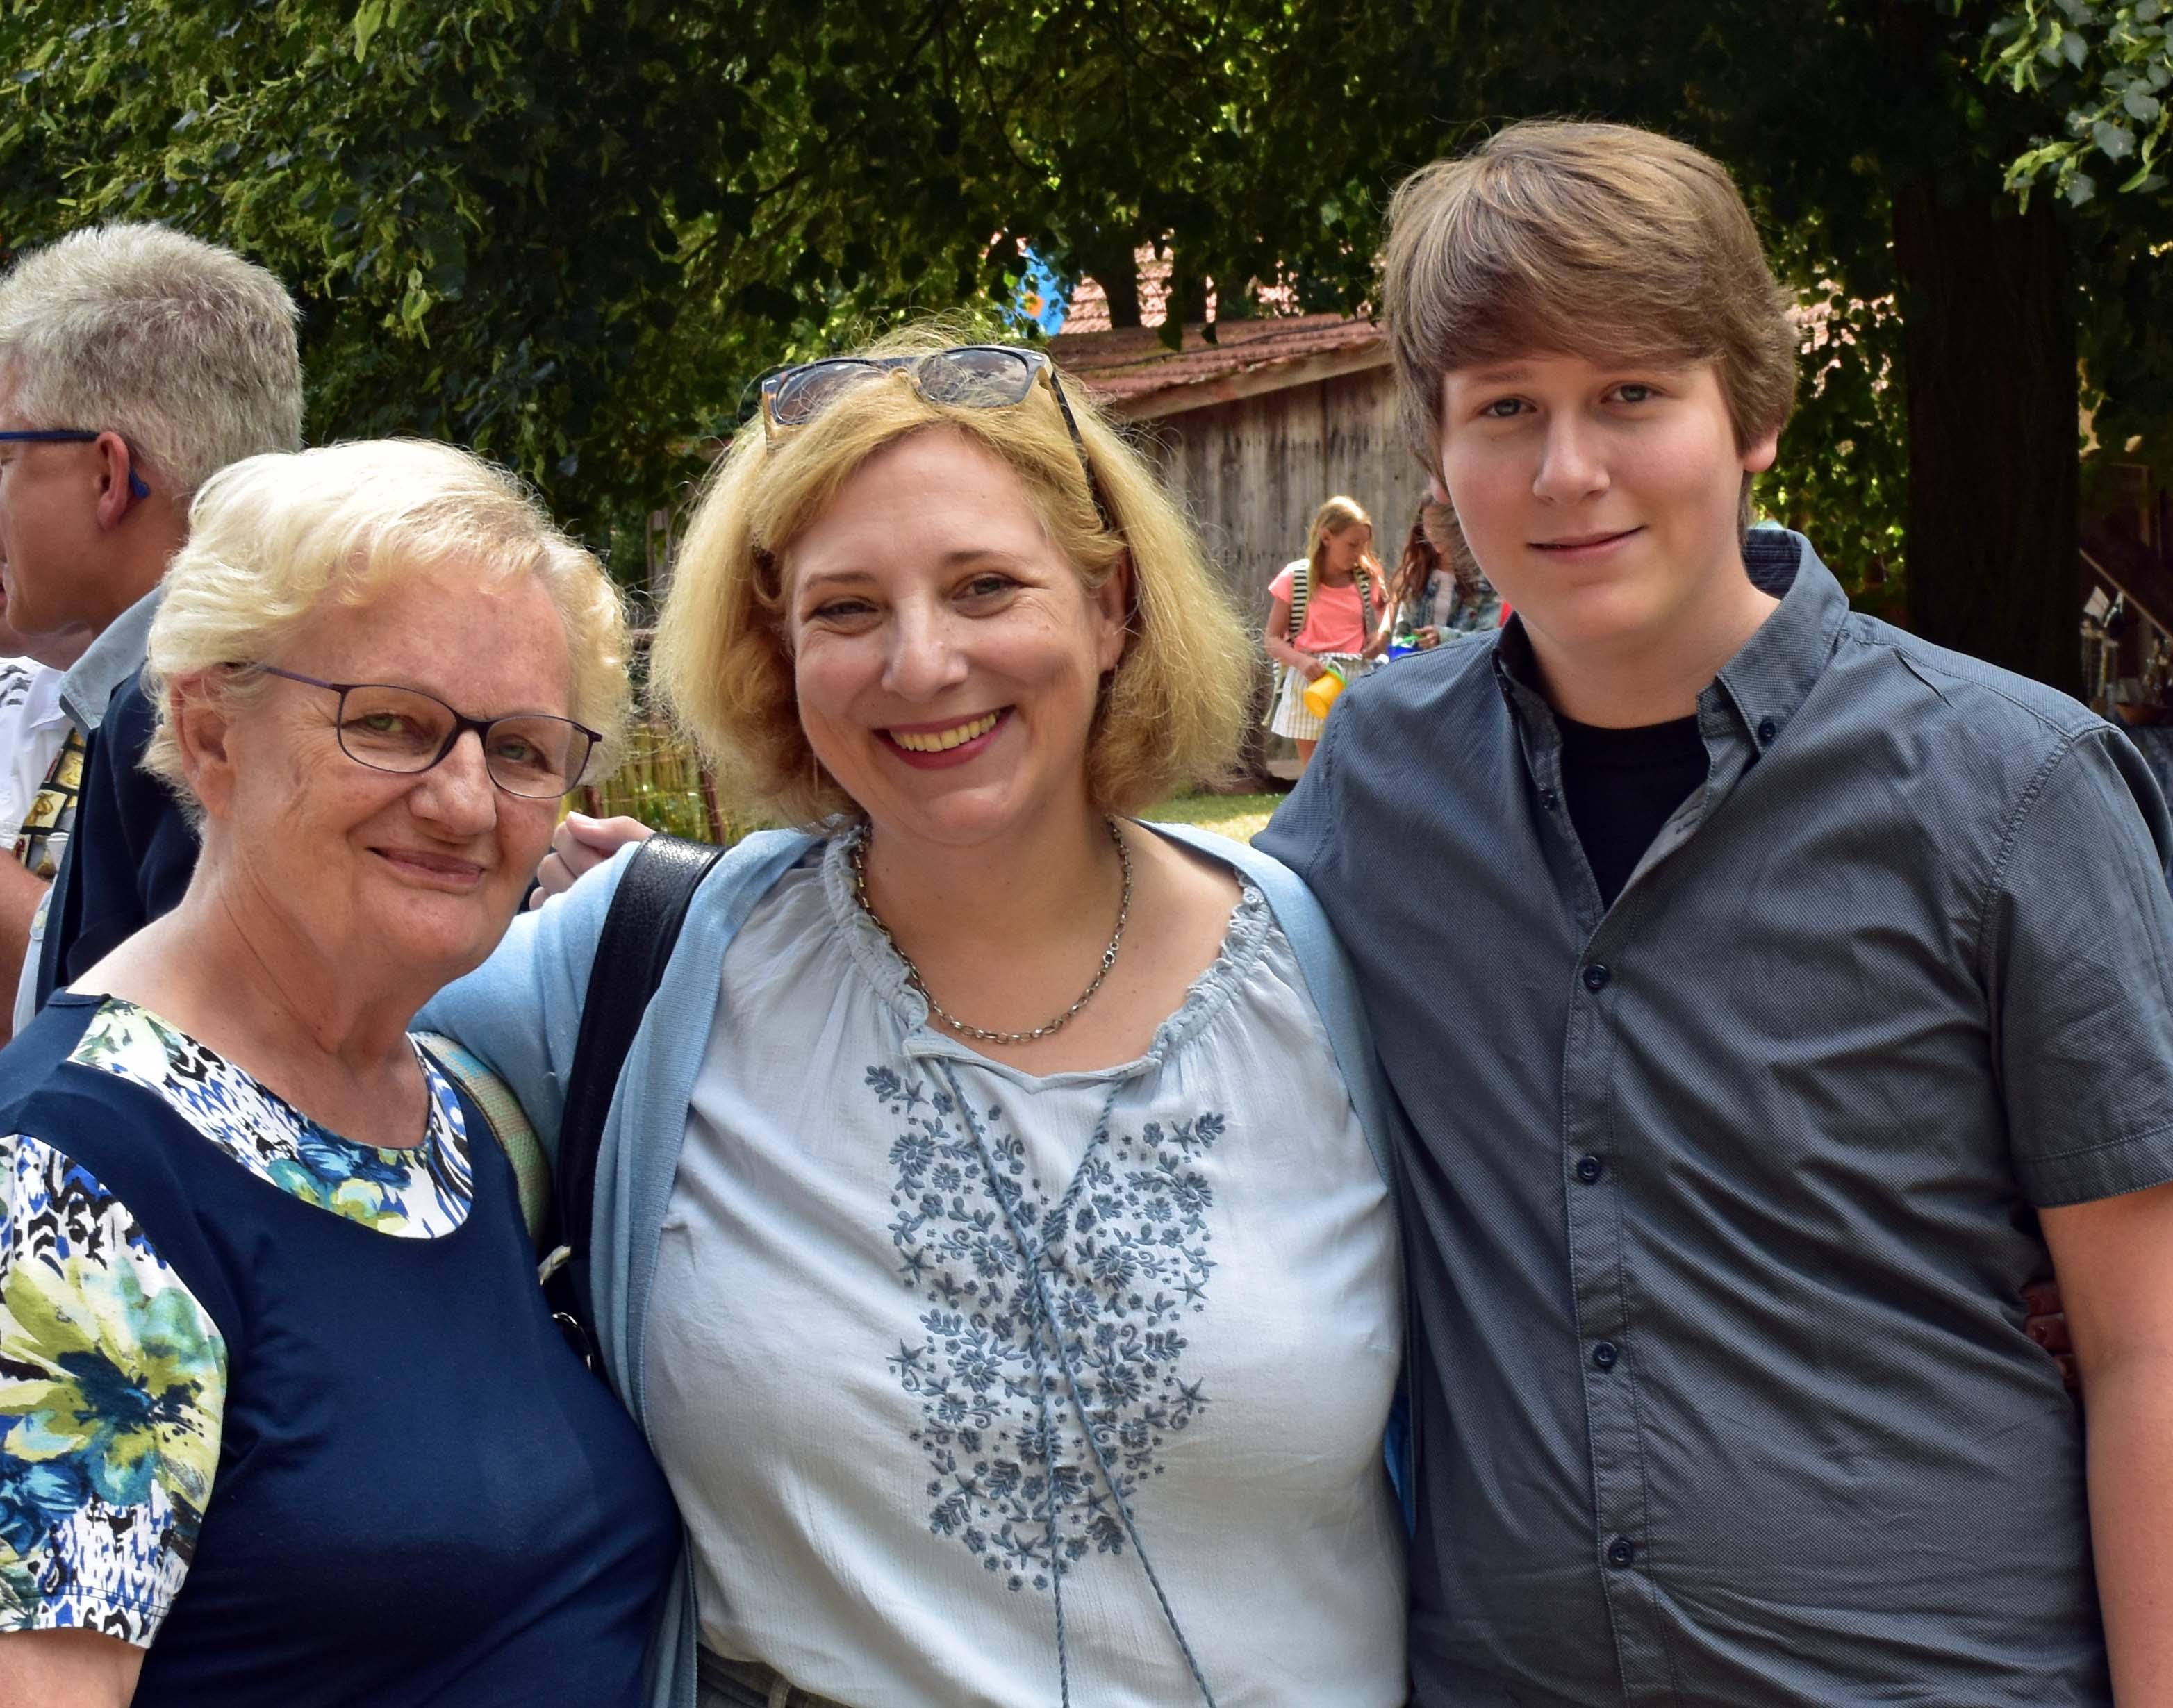 V.l.n.r. - Gudrun Roggenkamp, Dr. Daniela De Ridder und Fabian Segchelhoorn